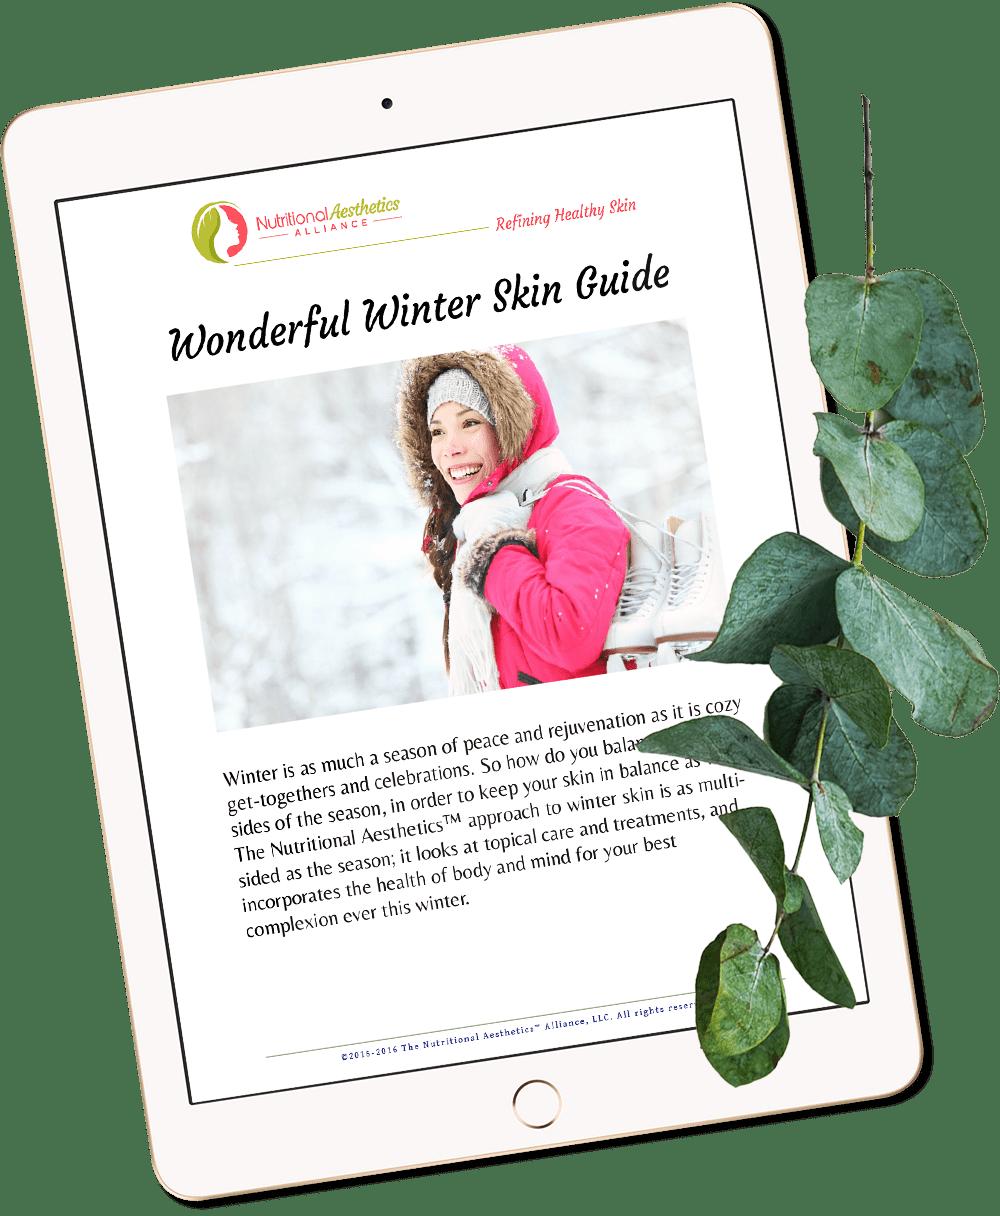 Winter holistic skin guide